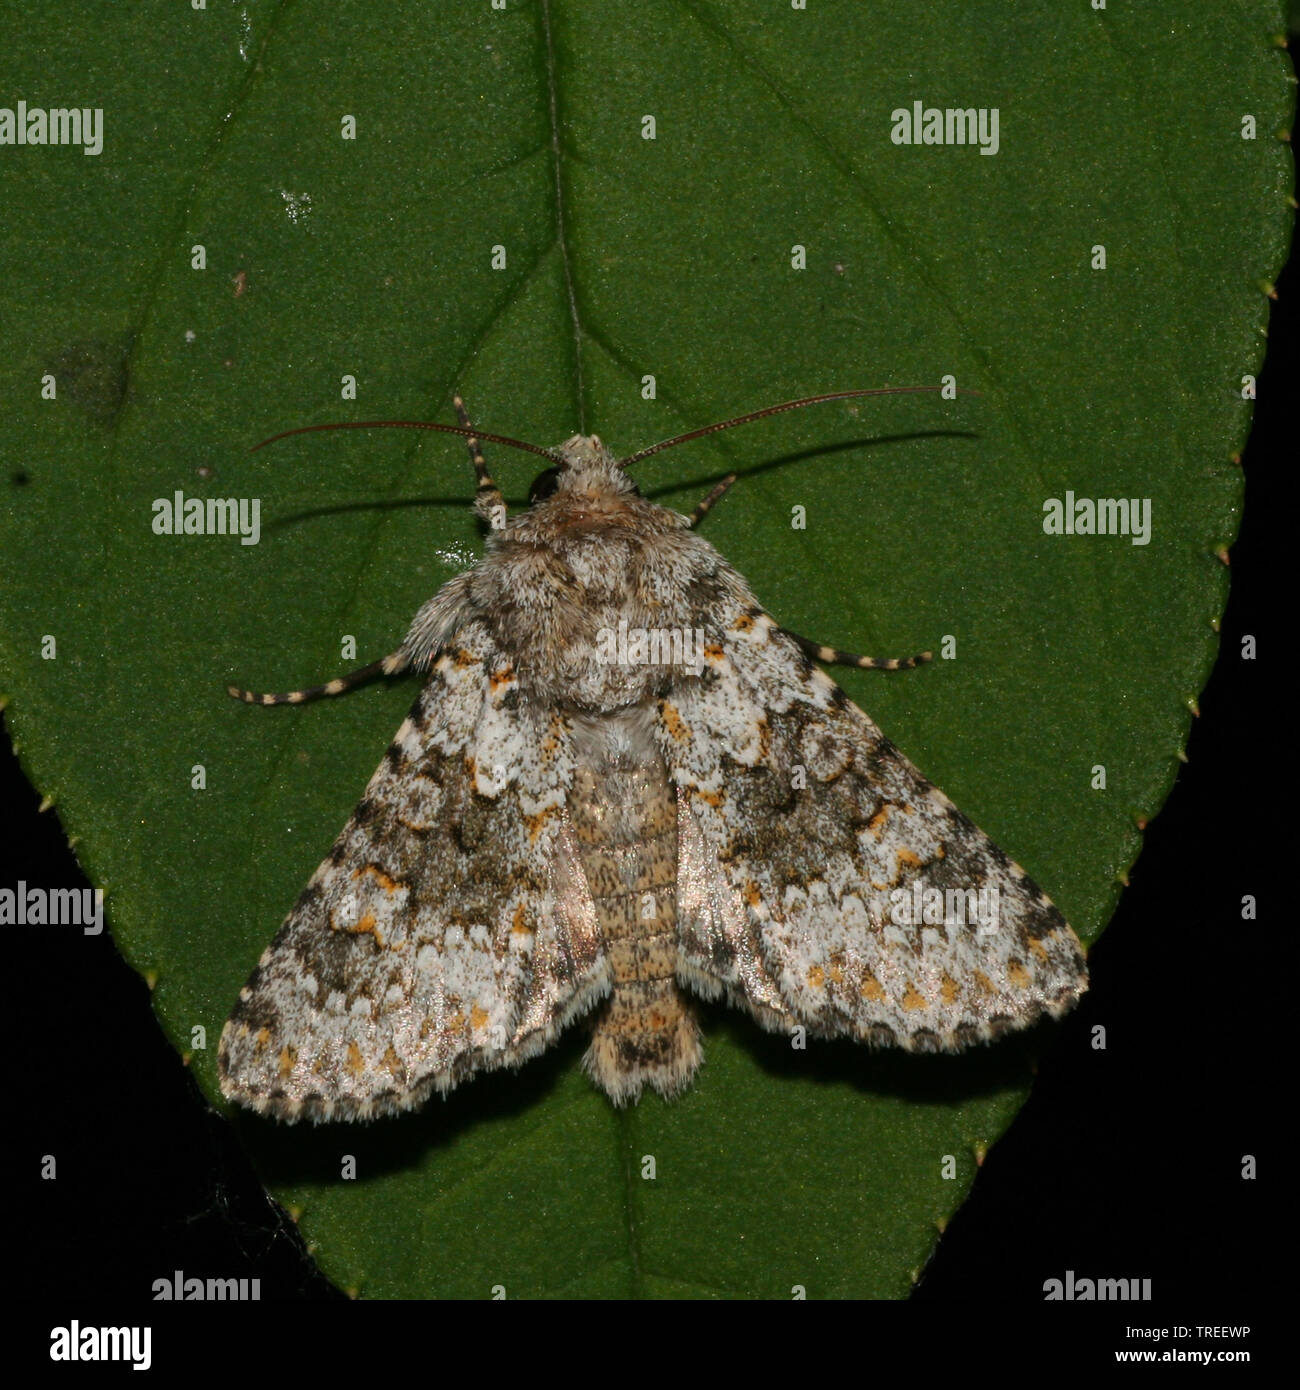 Kompasslatticheule, Kompasslattich-Eule (Hecatera dysodea), sitzt auf einem Blatt, Niederlande | small ranunculus (Hecatera dysodea), sits on a leaf, - Stock Image